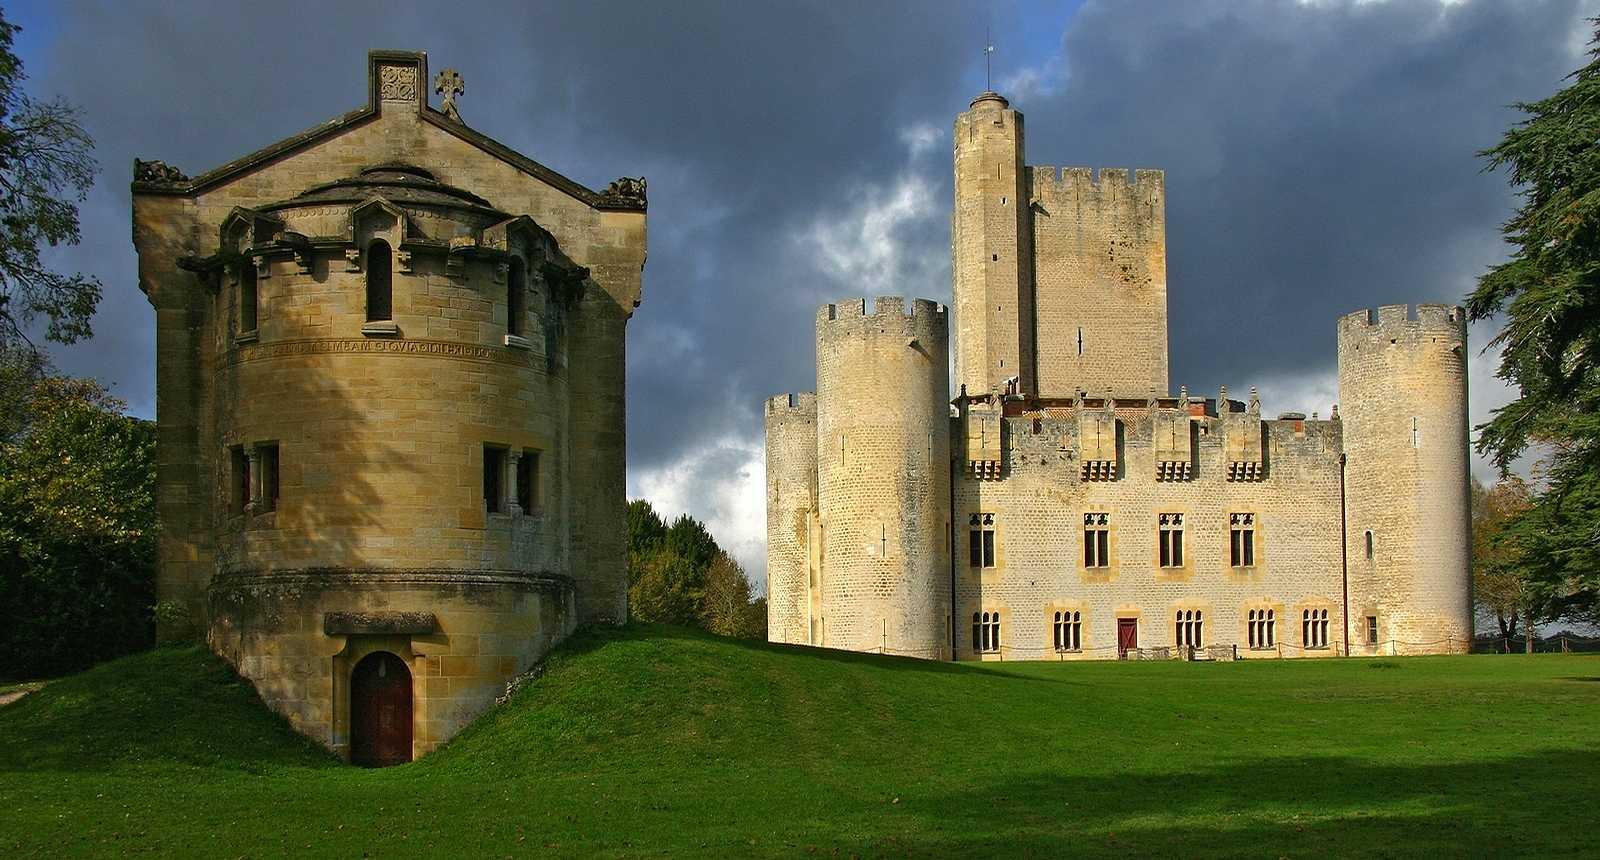 Image : Château de Roquetaillade